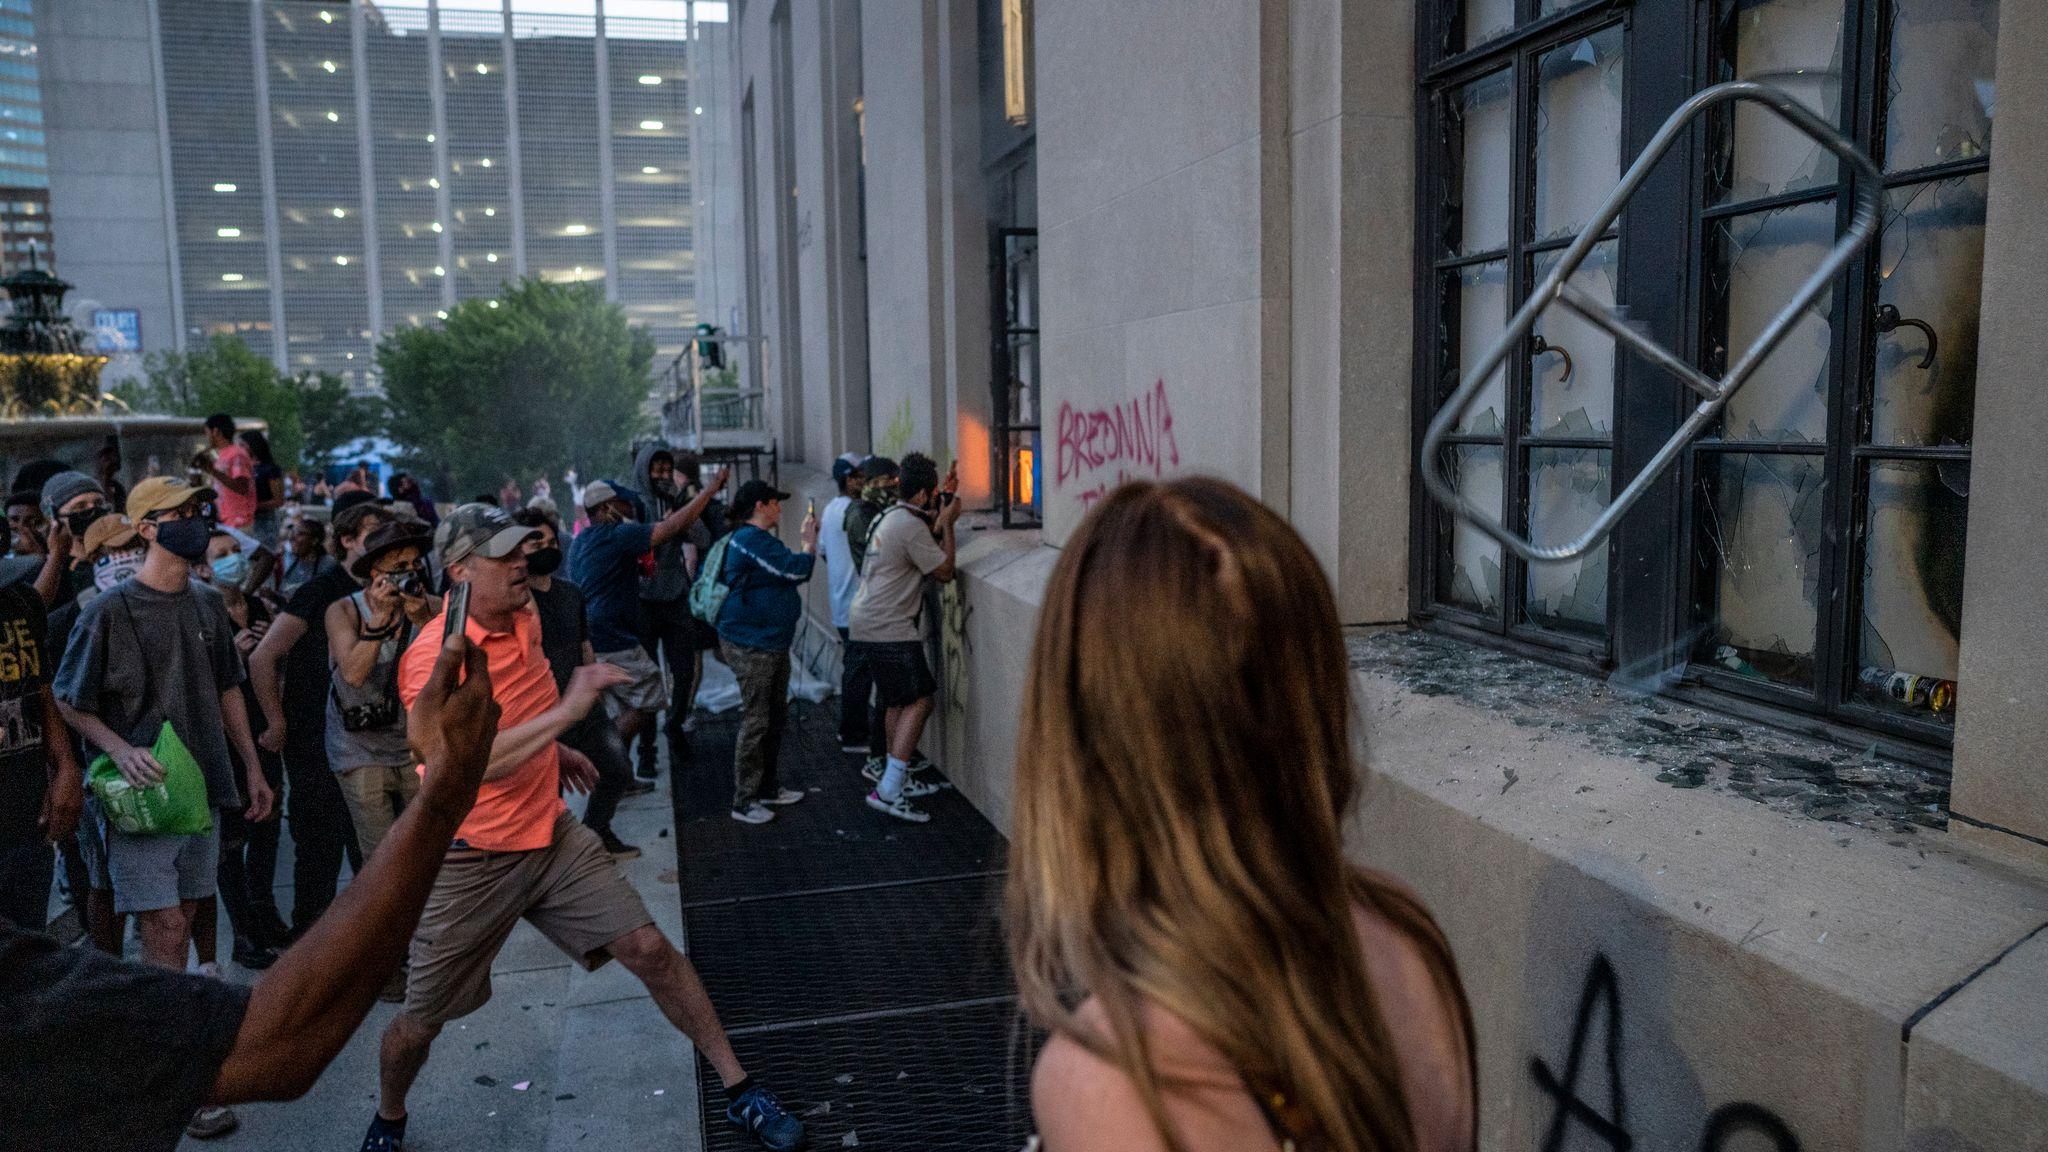 Nashville, Tenn., May 30 - Photojournalist John Partipilo captures the moment an object breaks a window at the Historic Metro Nashville Courthouse. (Photo: John Partipilo)